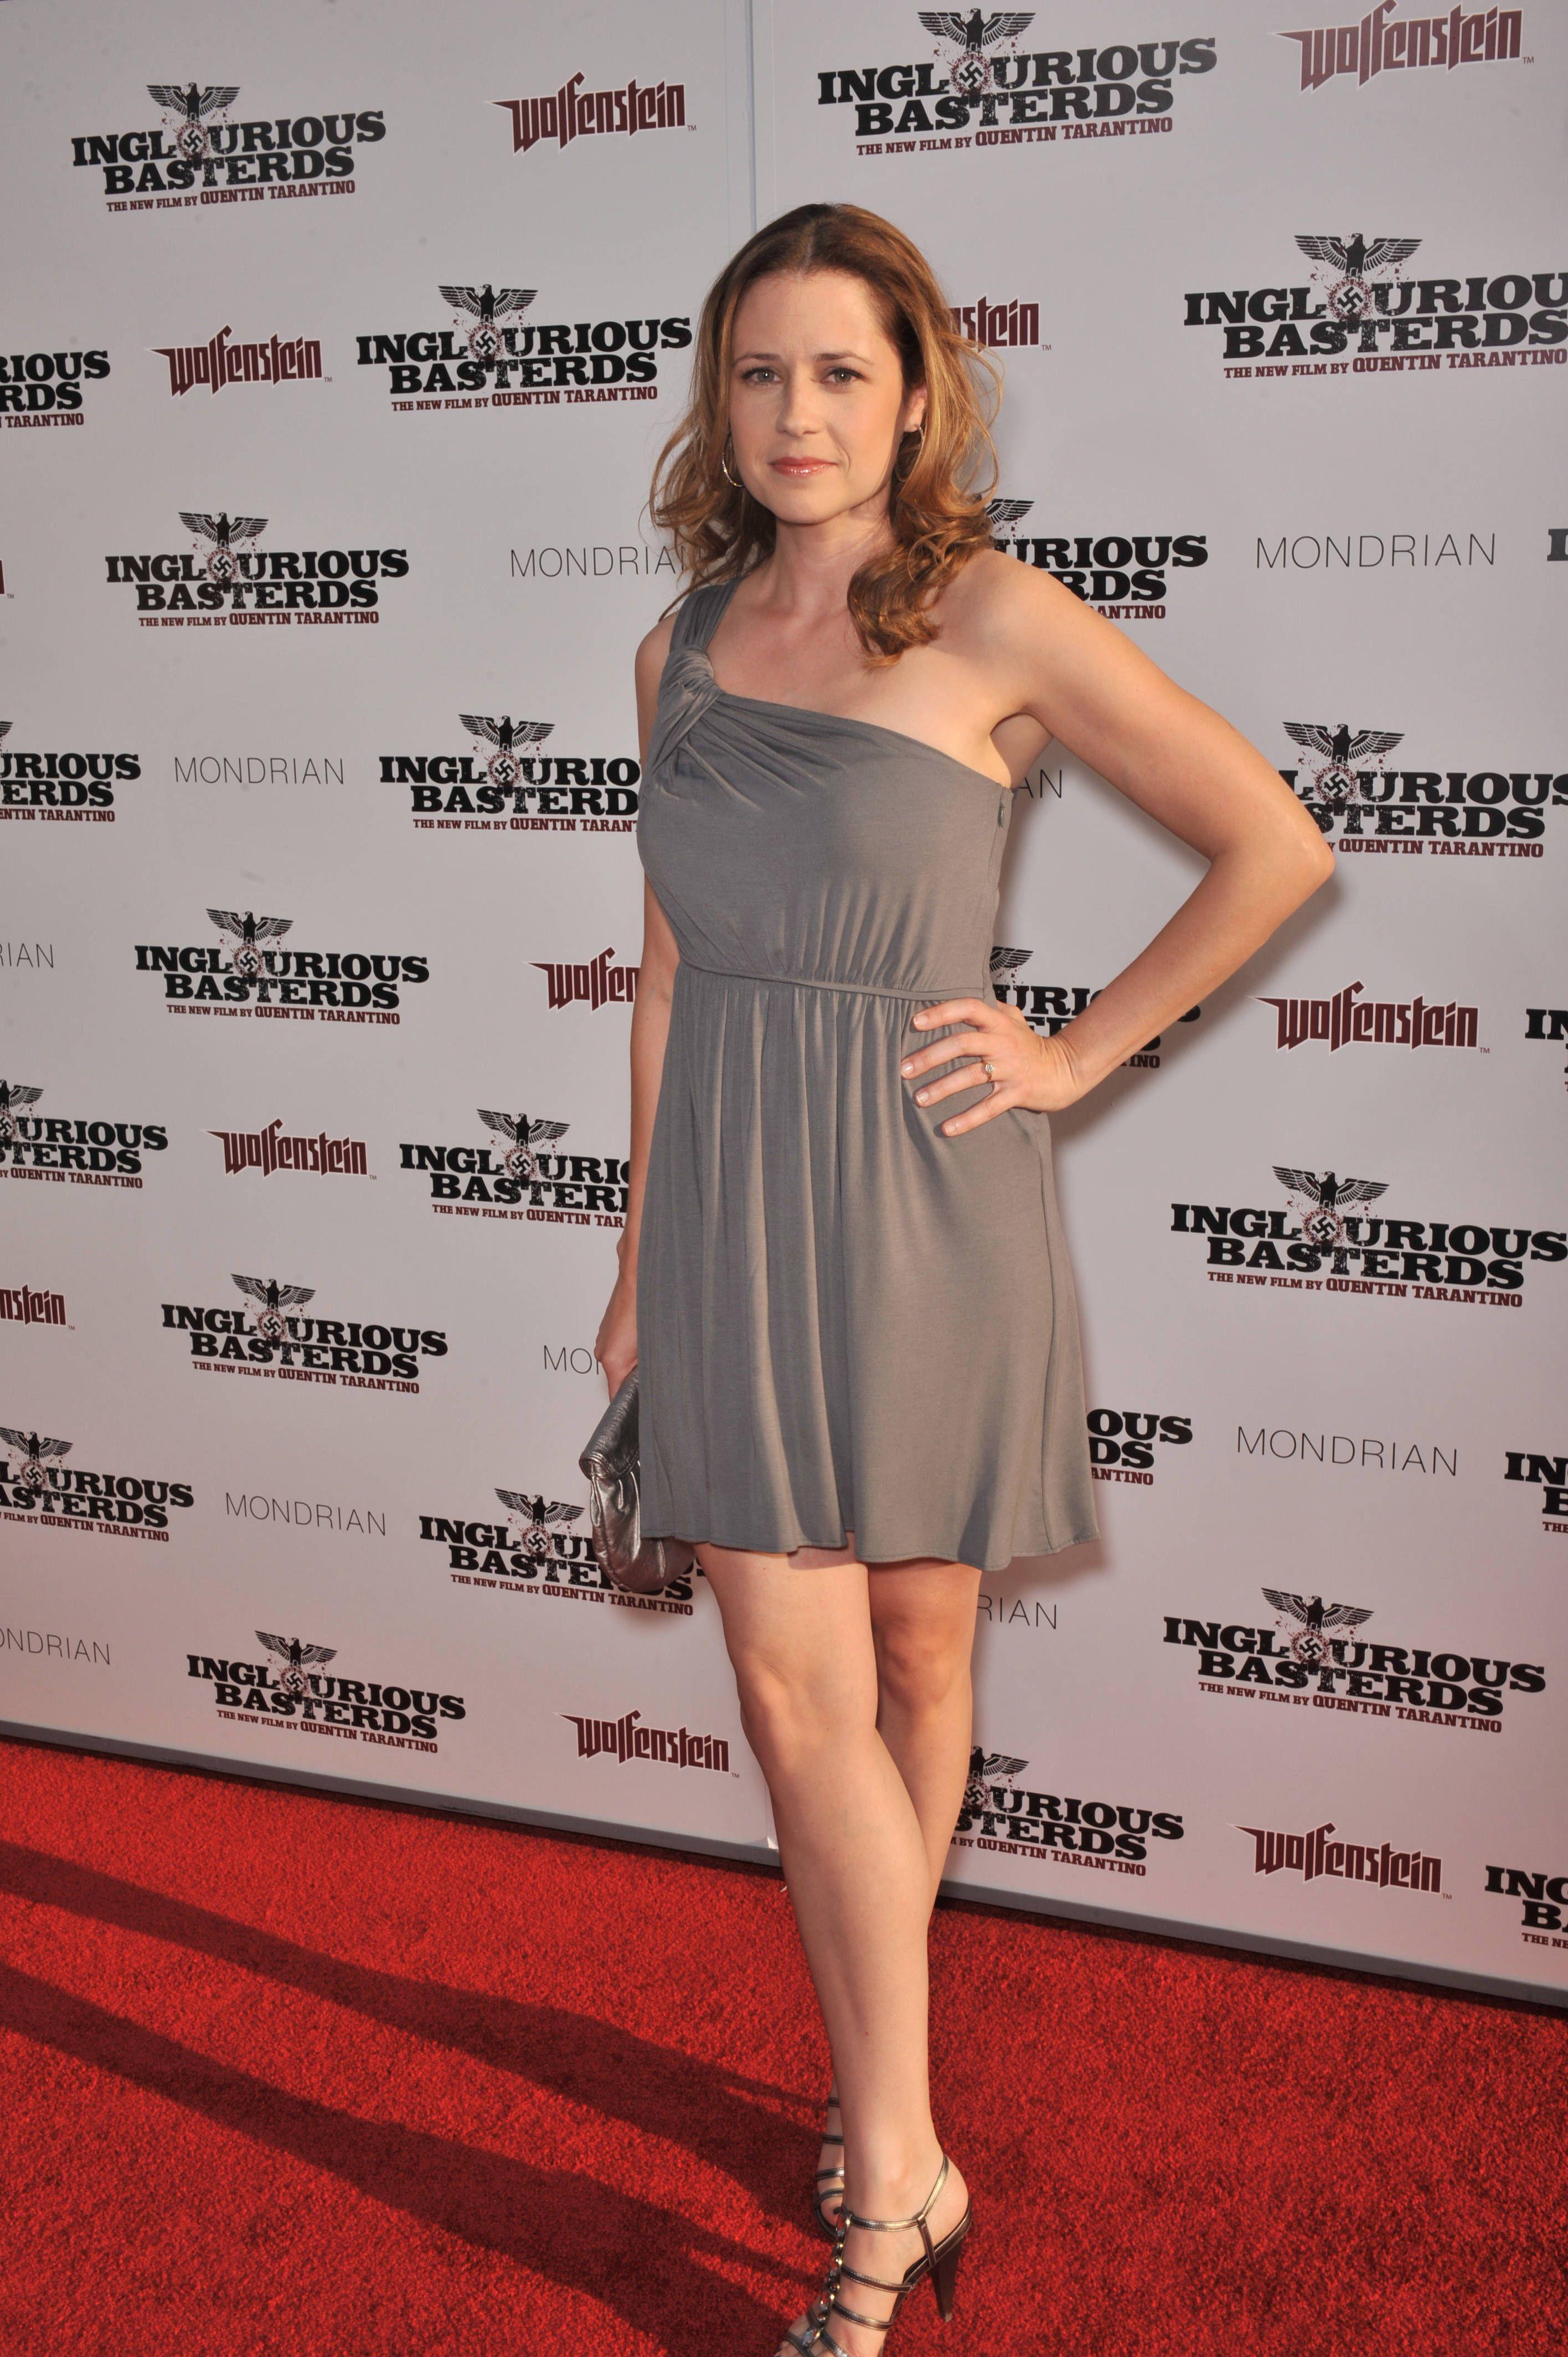 Celebrity Jenna Renee nude (53 photo), Pussy, Paparazzi, Feet, braless 2015